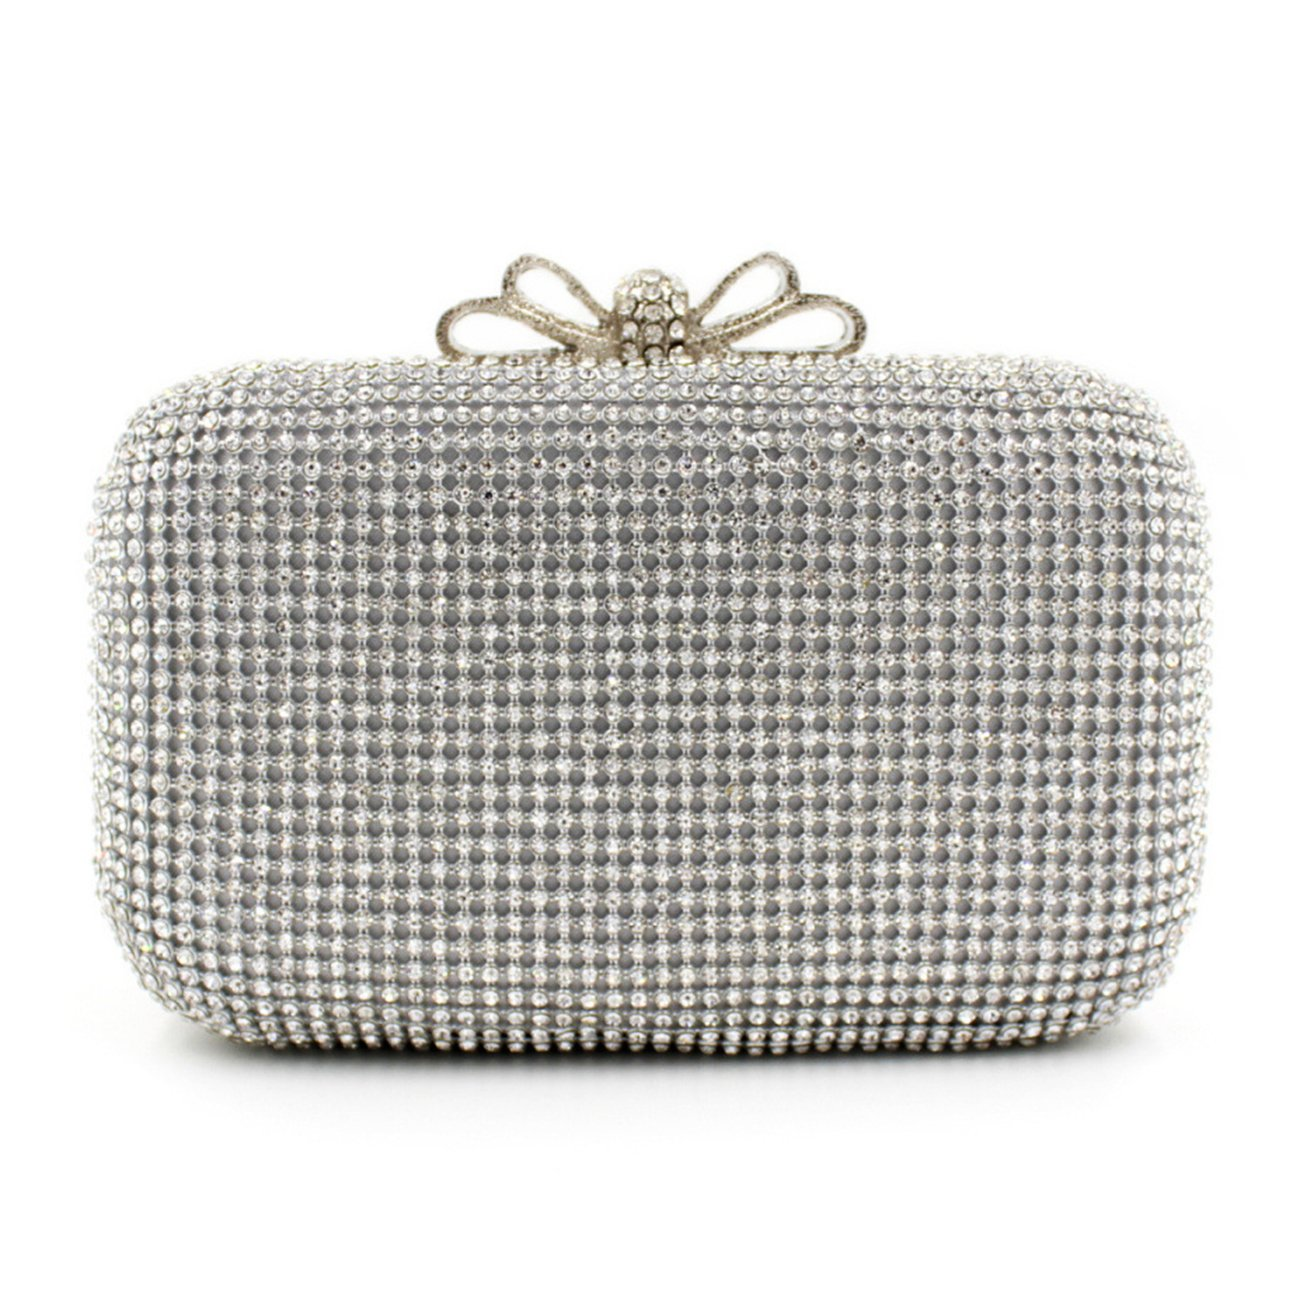 Clutch Evening Bag, Fit & Wit Giltter Beaded Flap Clutch Evening Handbag Purse (Style 3)